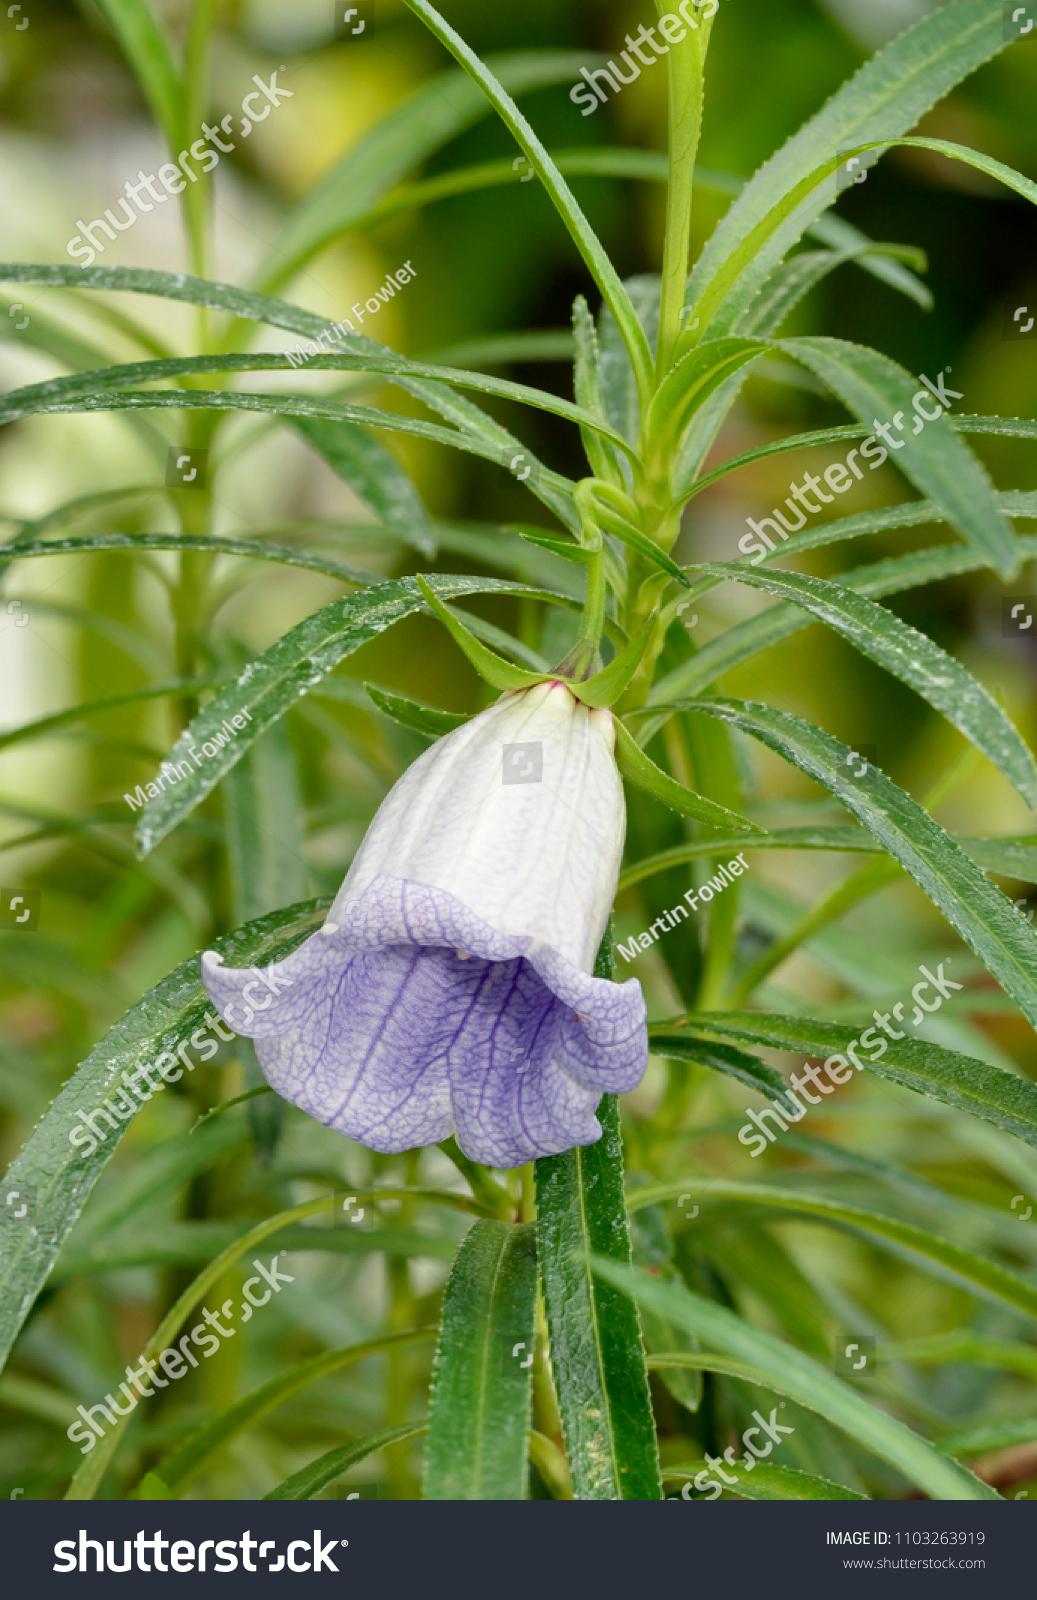 Nesocodon mauritianus Campanulaceae flower endemic to the island of Mauritius #1103263919